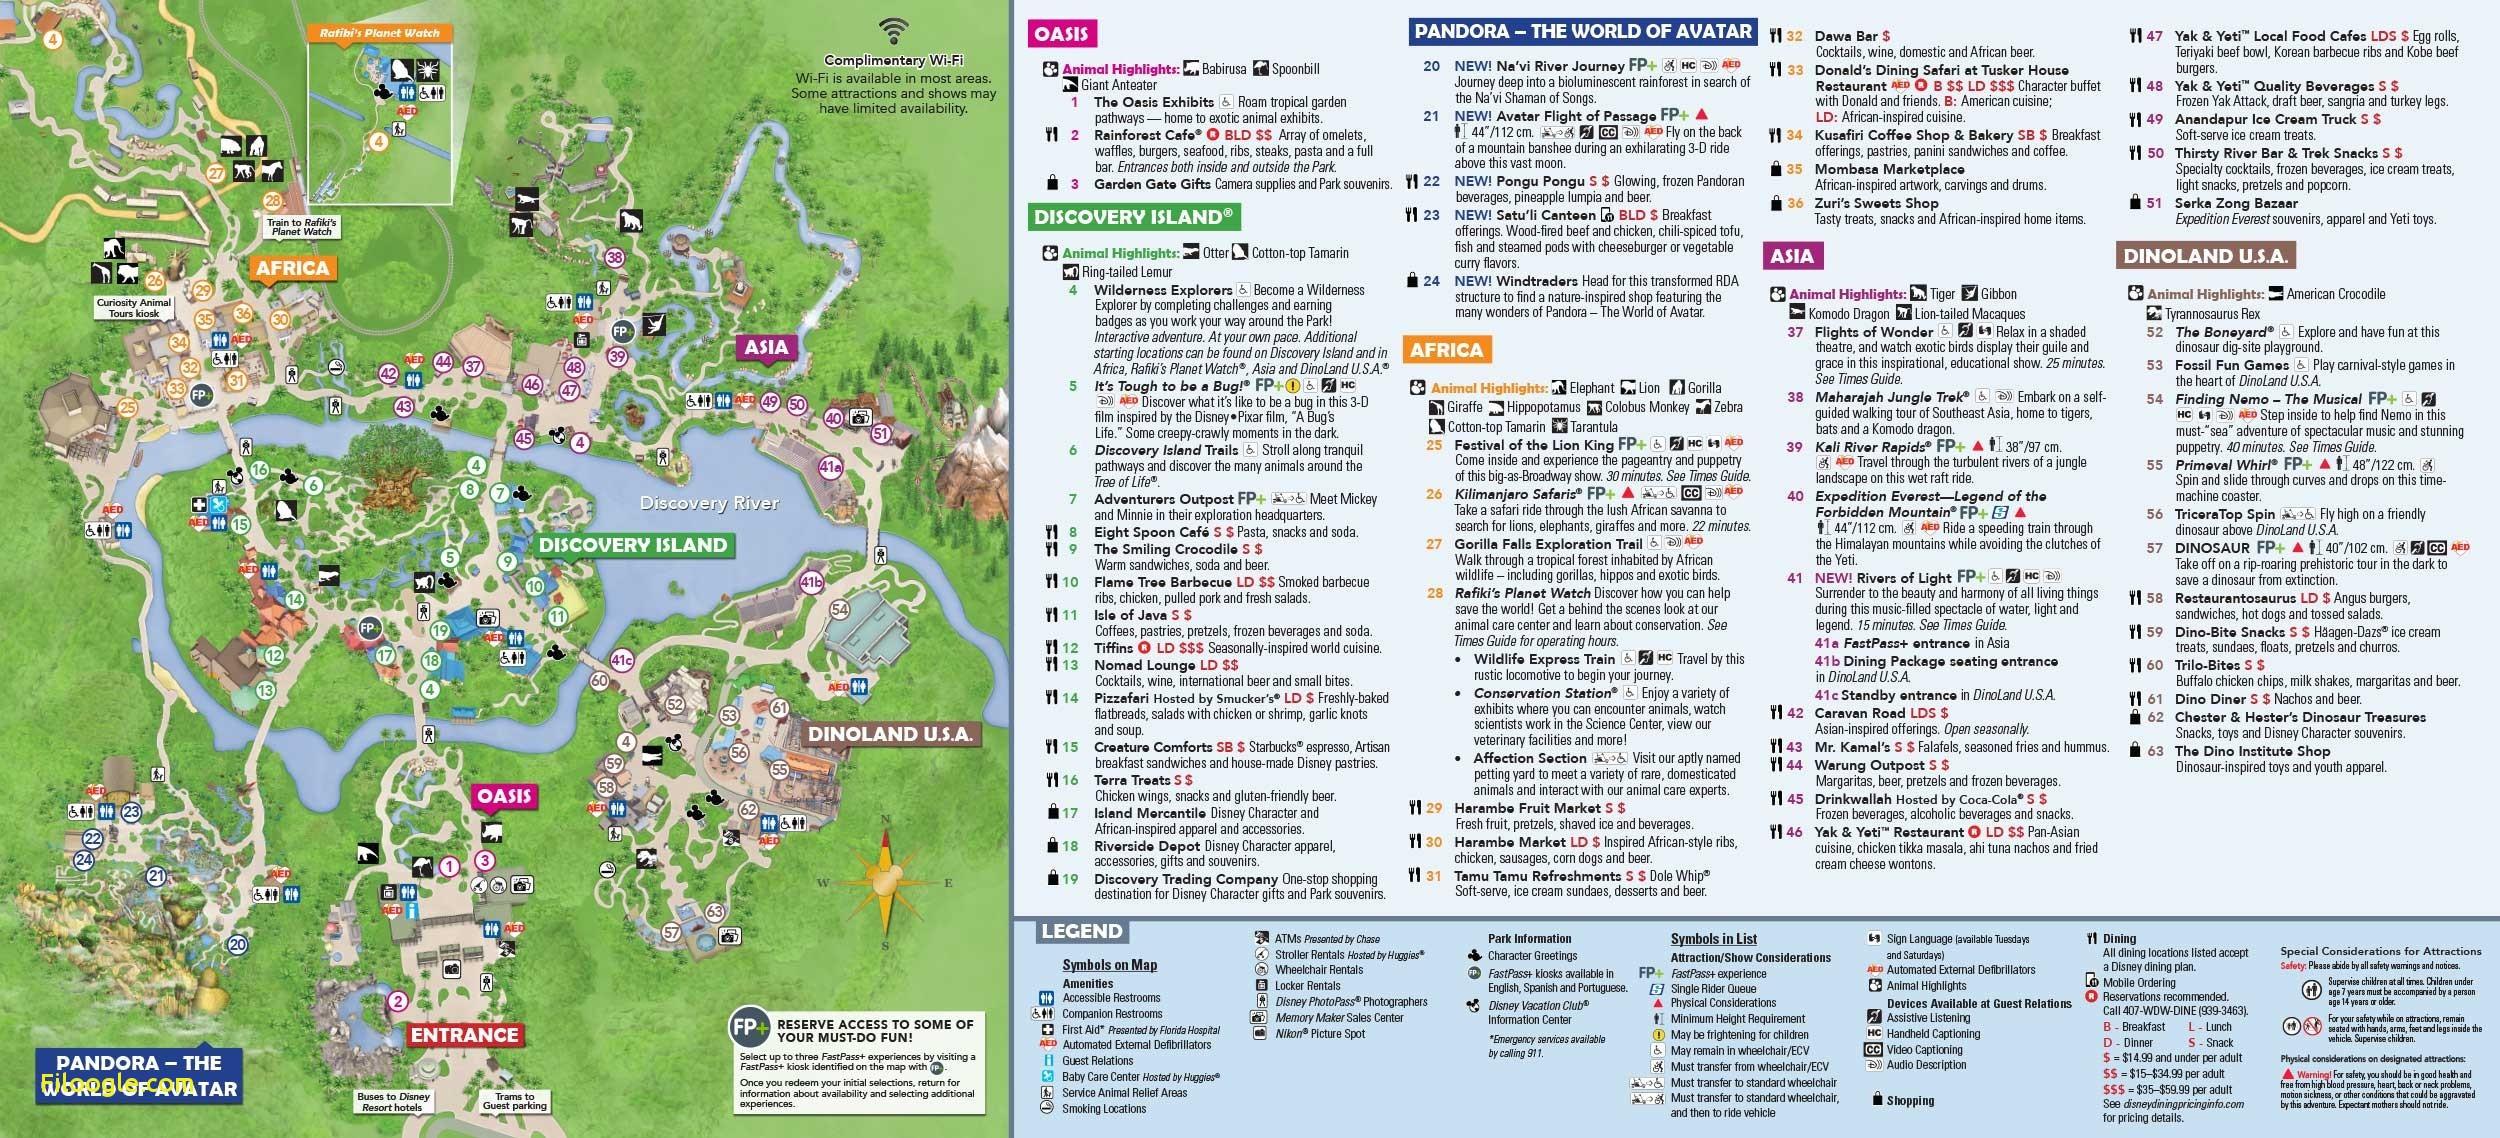 Google Maps Palm Springs California Best Of Vacation Homes Orlando - Google Maps Orlando Florida